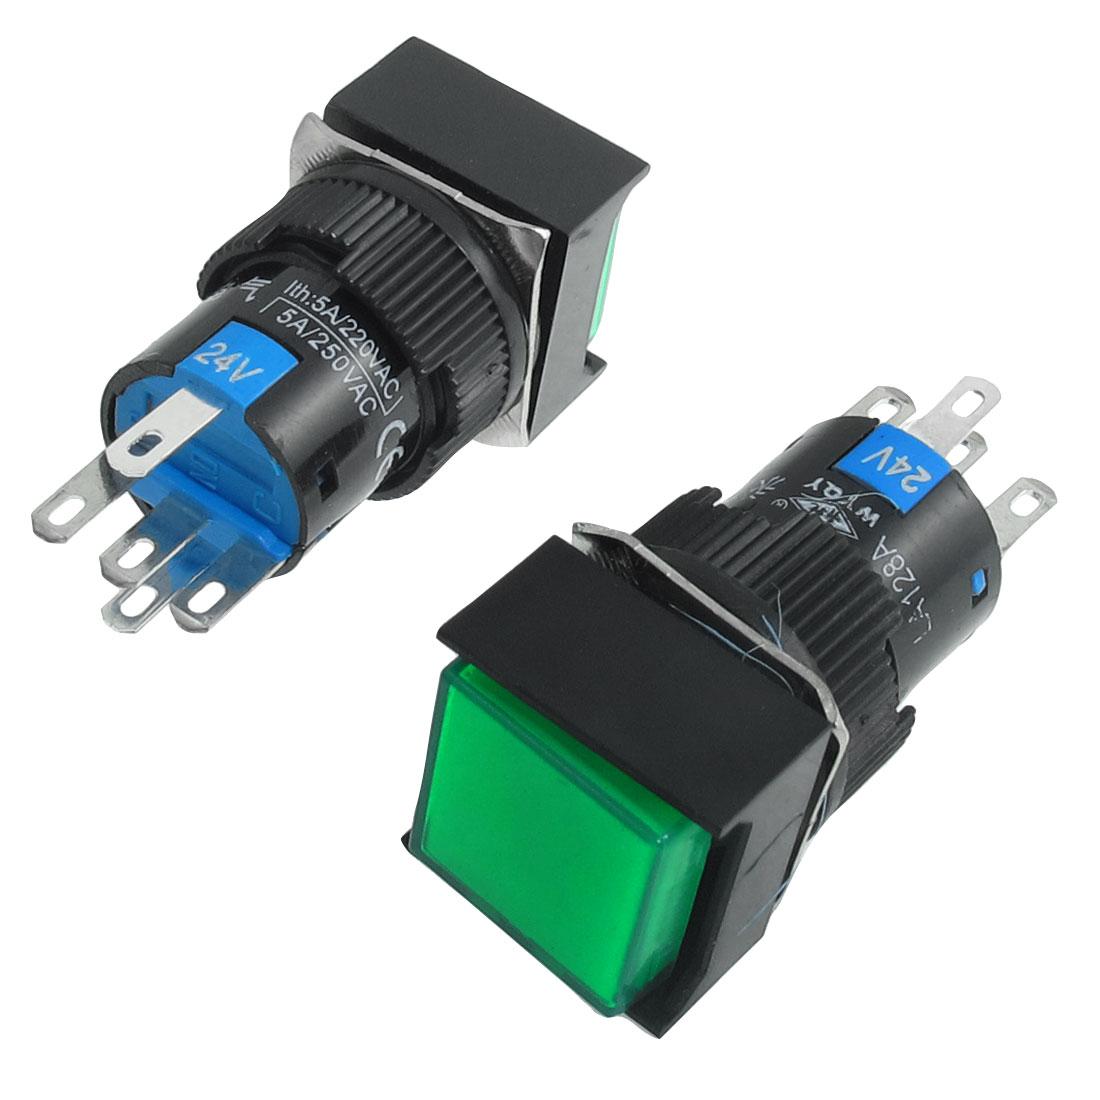 2-x-5P-Momentary-1NO-1NC-Green-Neon-Light-Square-Push-Button-Switch-24V